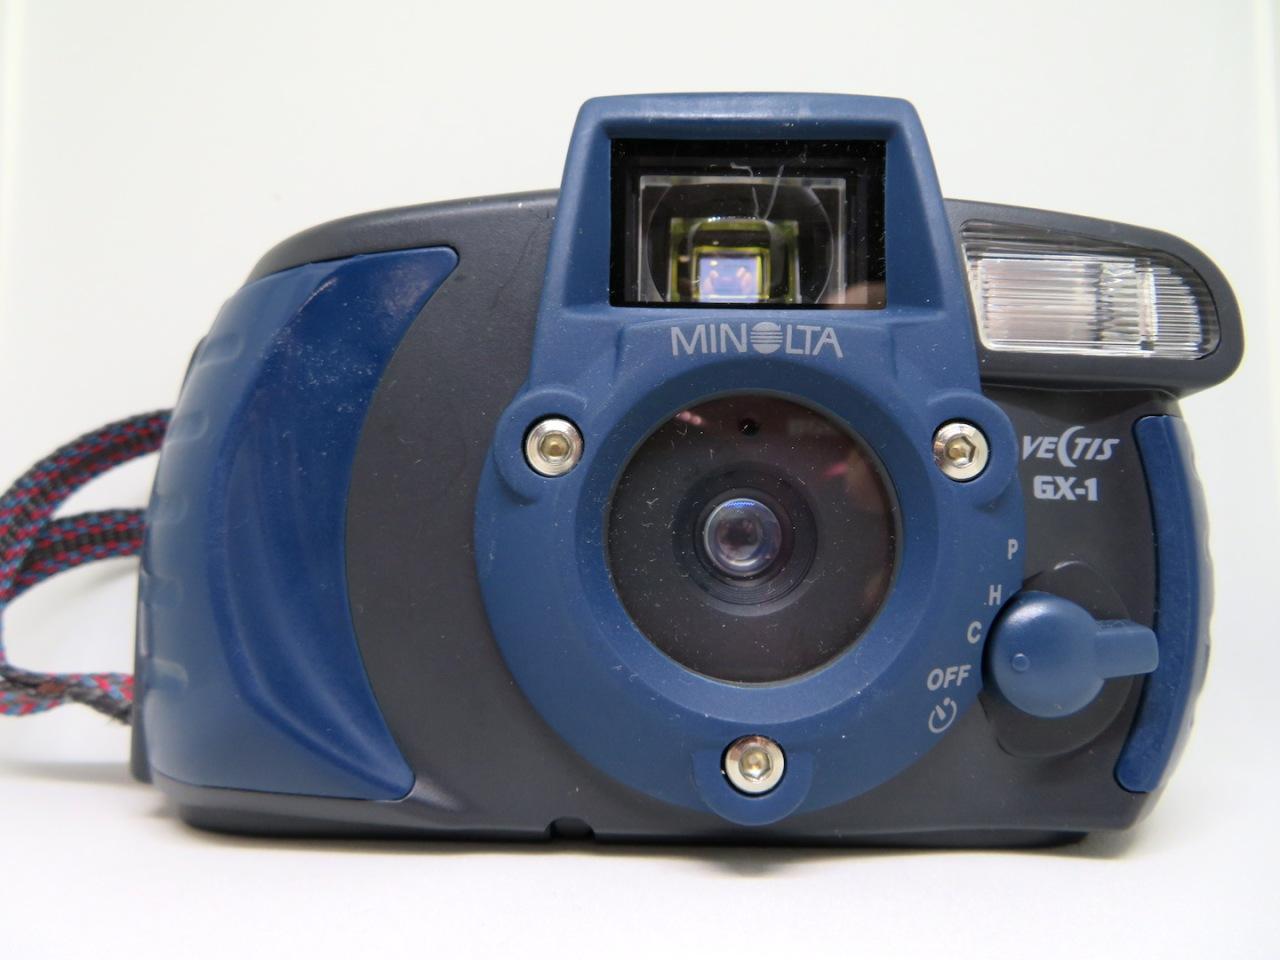 Minolta Vectis GX-1aps